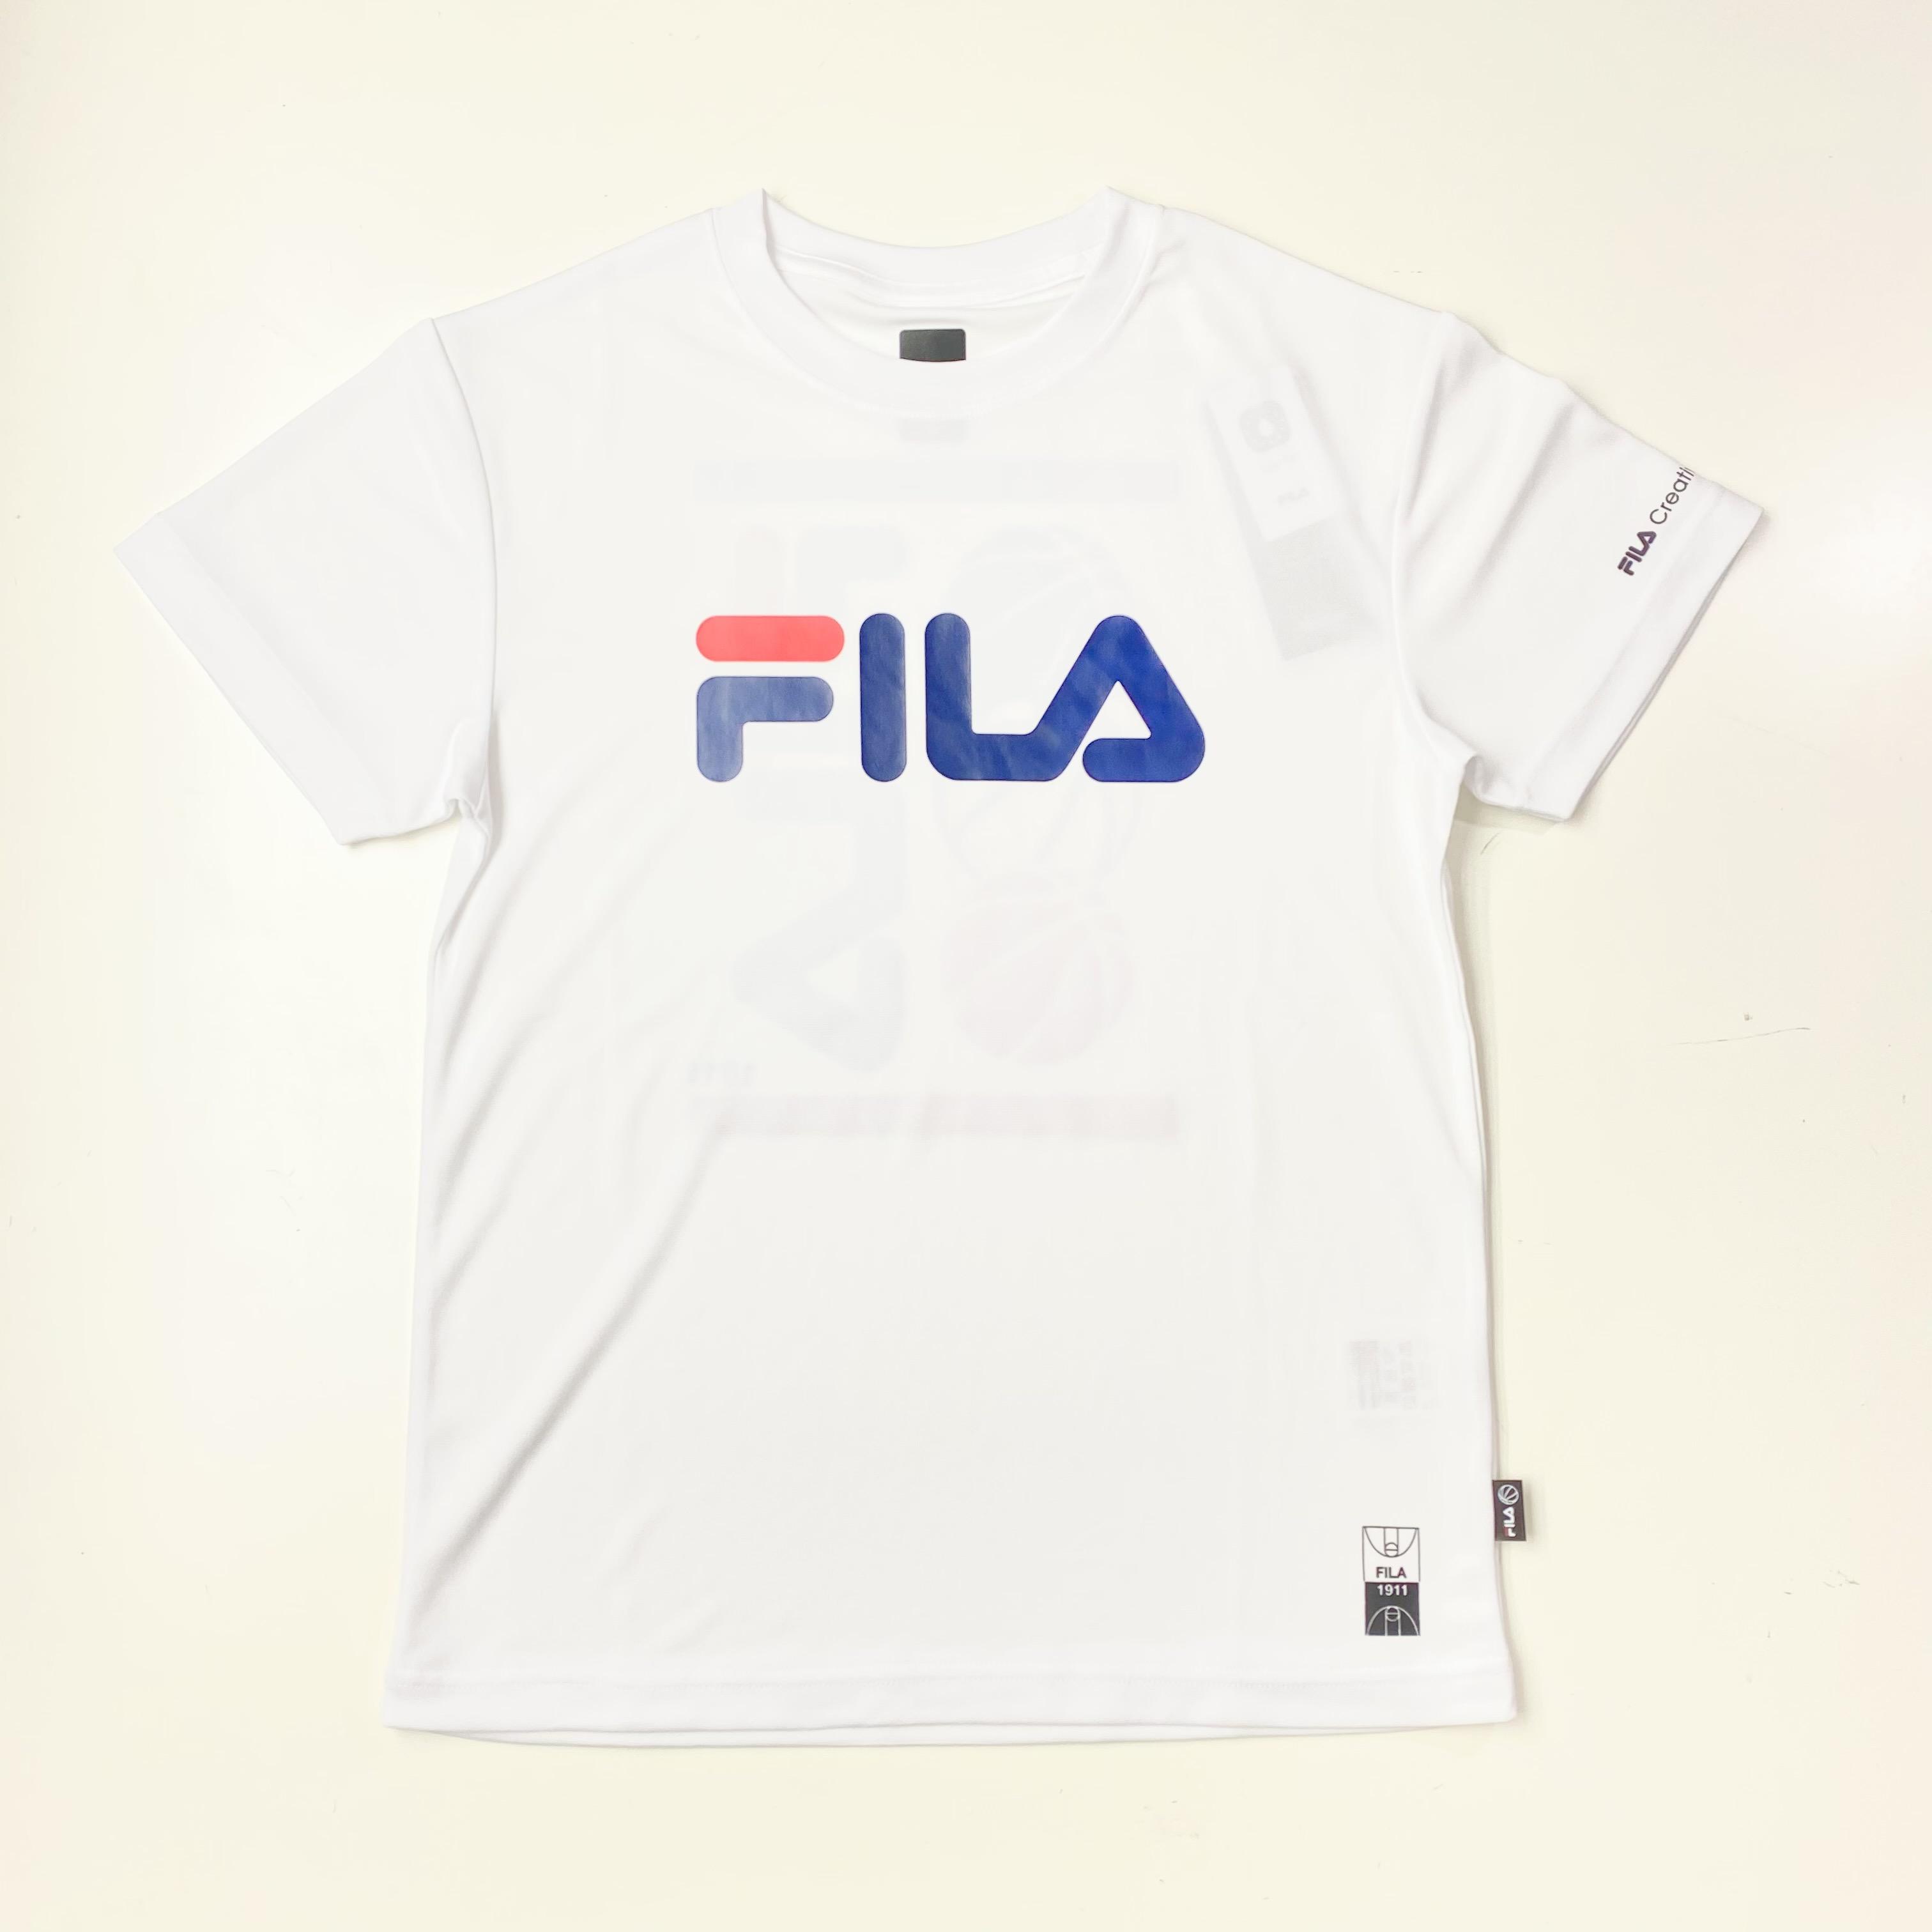 FS5007 / FILA / S/SCREWNECKSHIRT / フィラ / TEE / Tシャツ / メンズ / バスケットボール